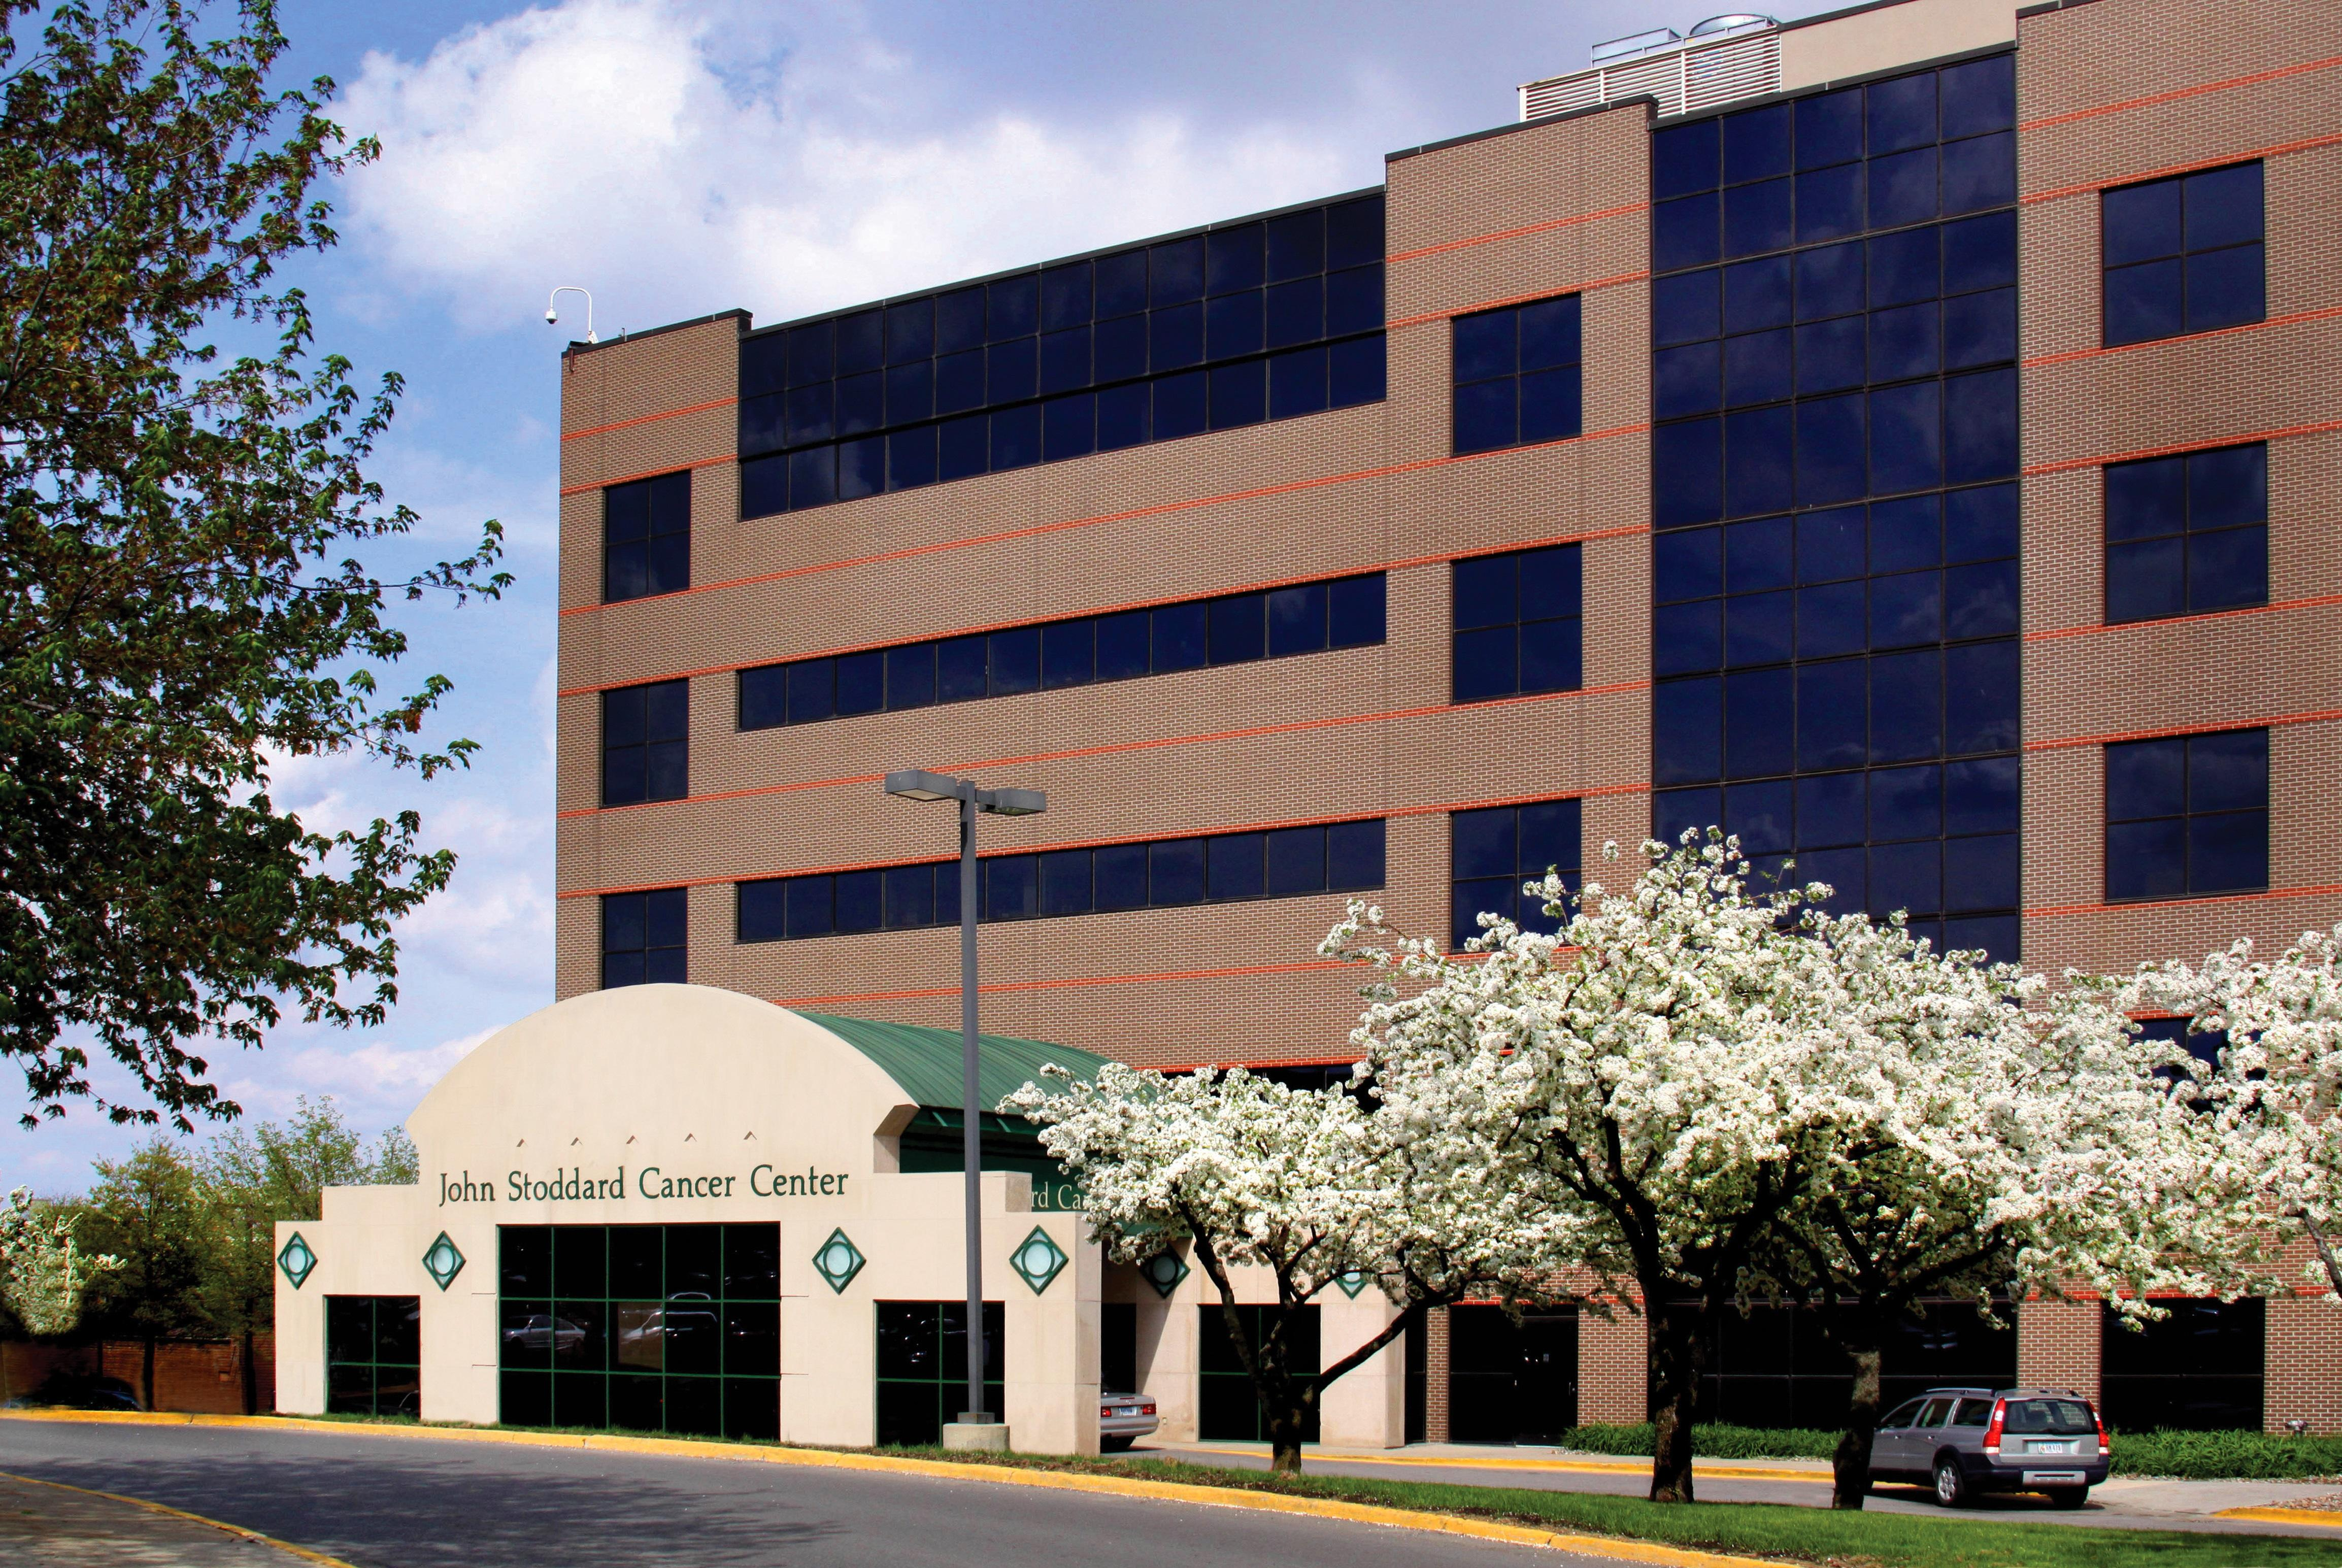 John Stoddard Cancer Center image 0